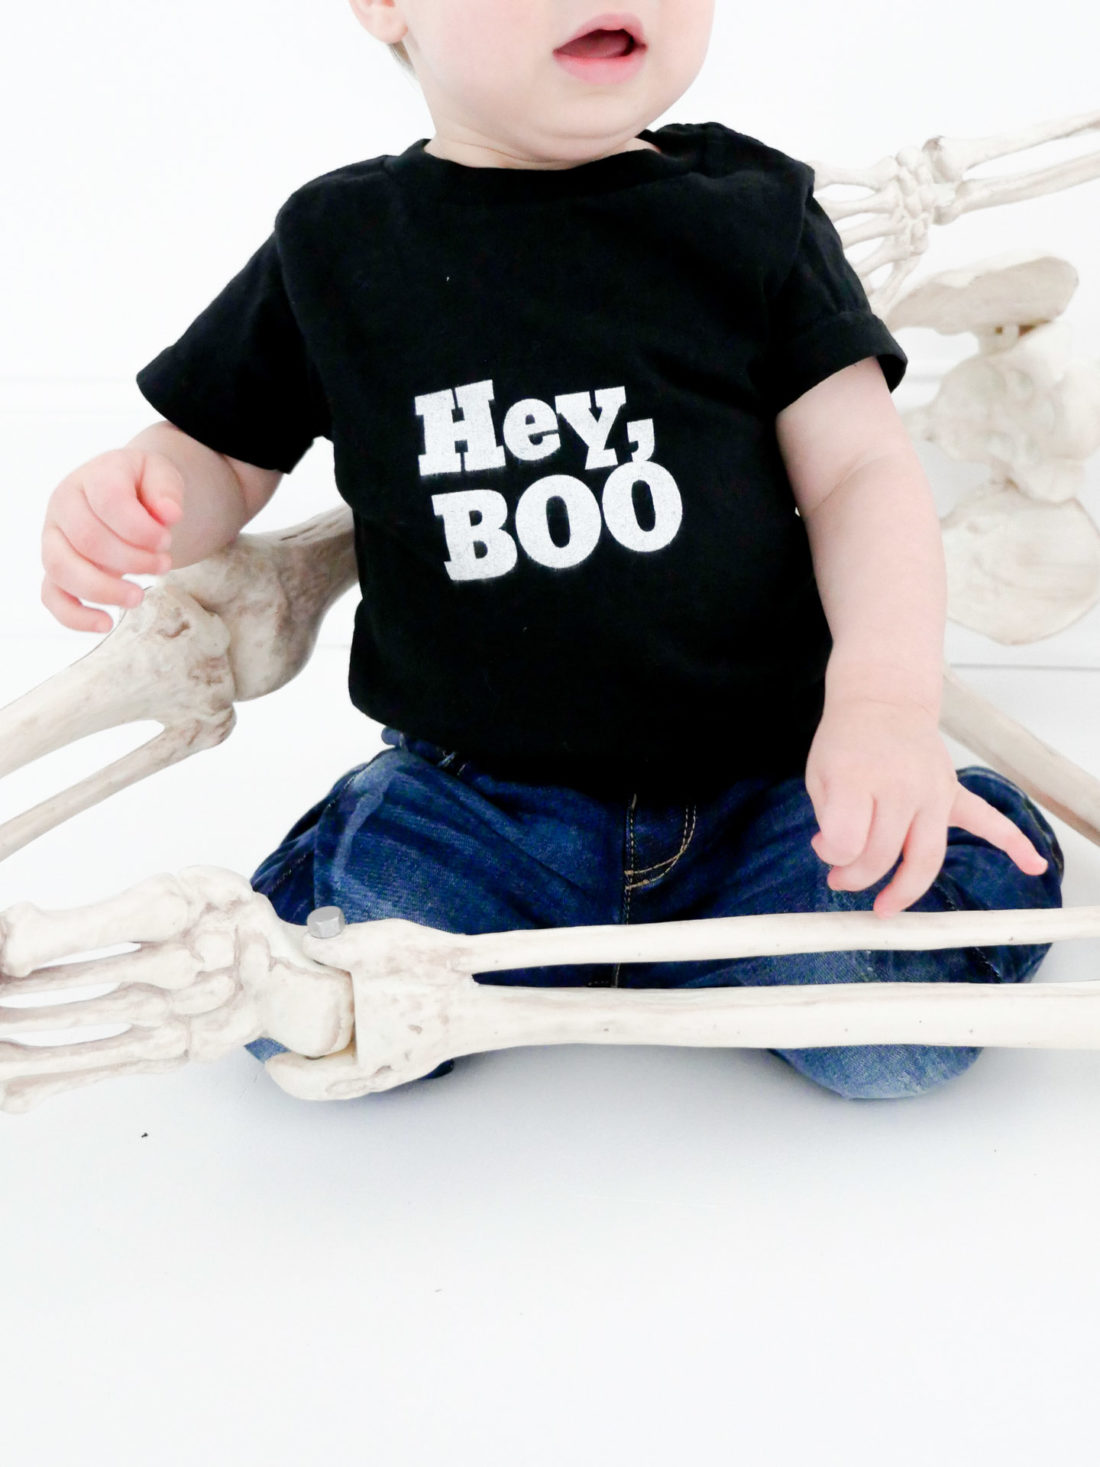 Major Martino wears a custom tee shirt designed using The Happily App for Halloween